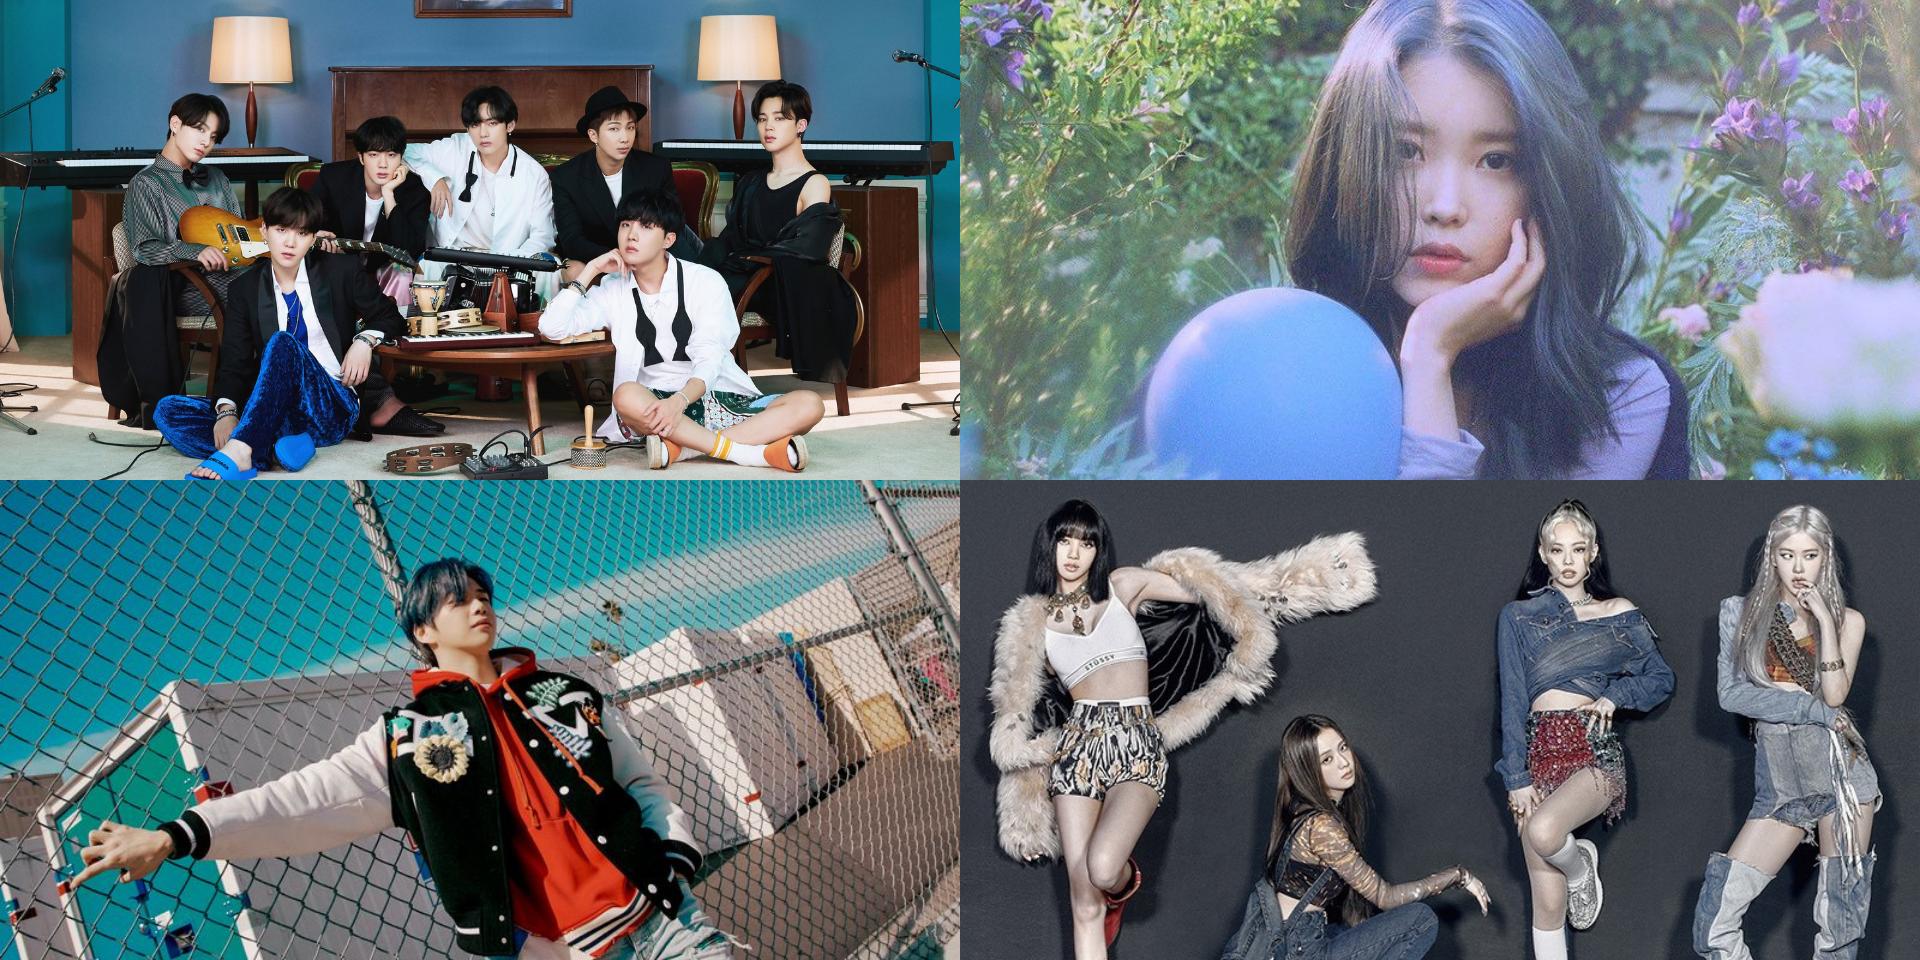 BLACKPINK, BTS, IU, Kang Daniel, and more win at the 2020 APAN Awards - see the list of Popularity Awards winners